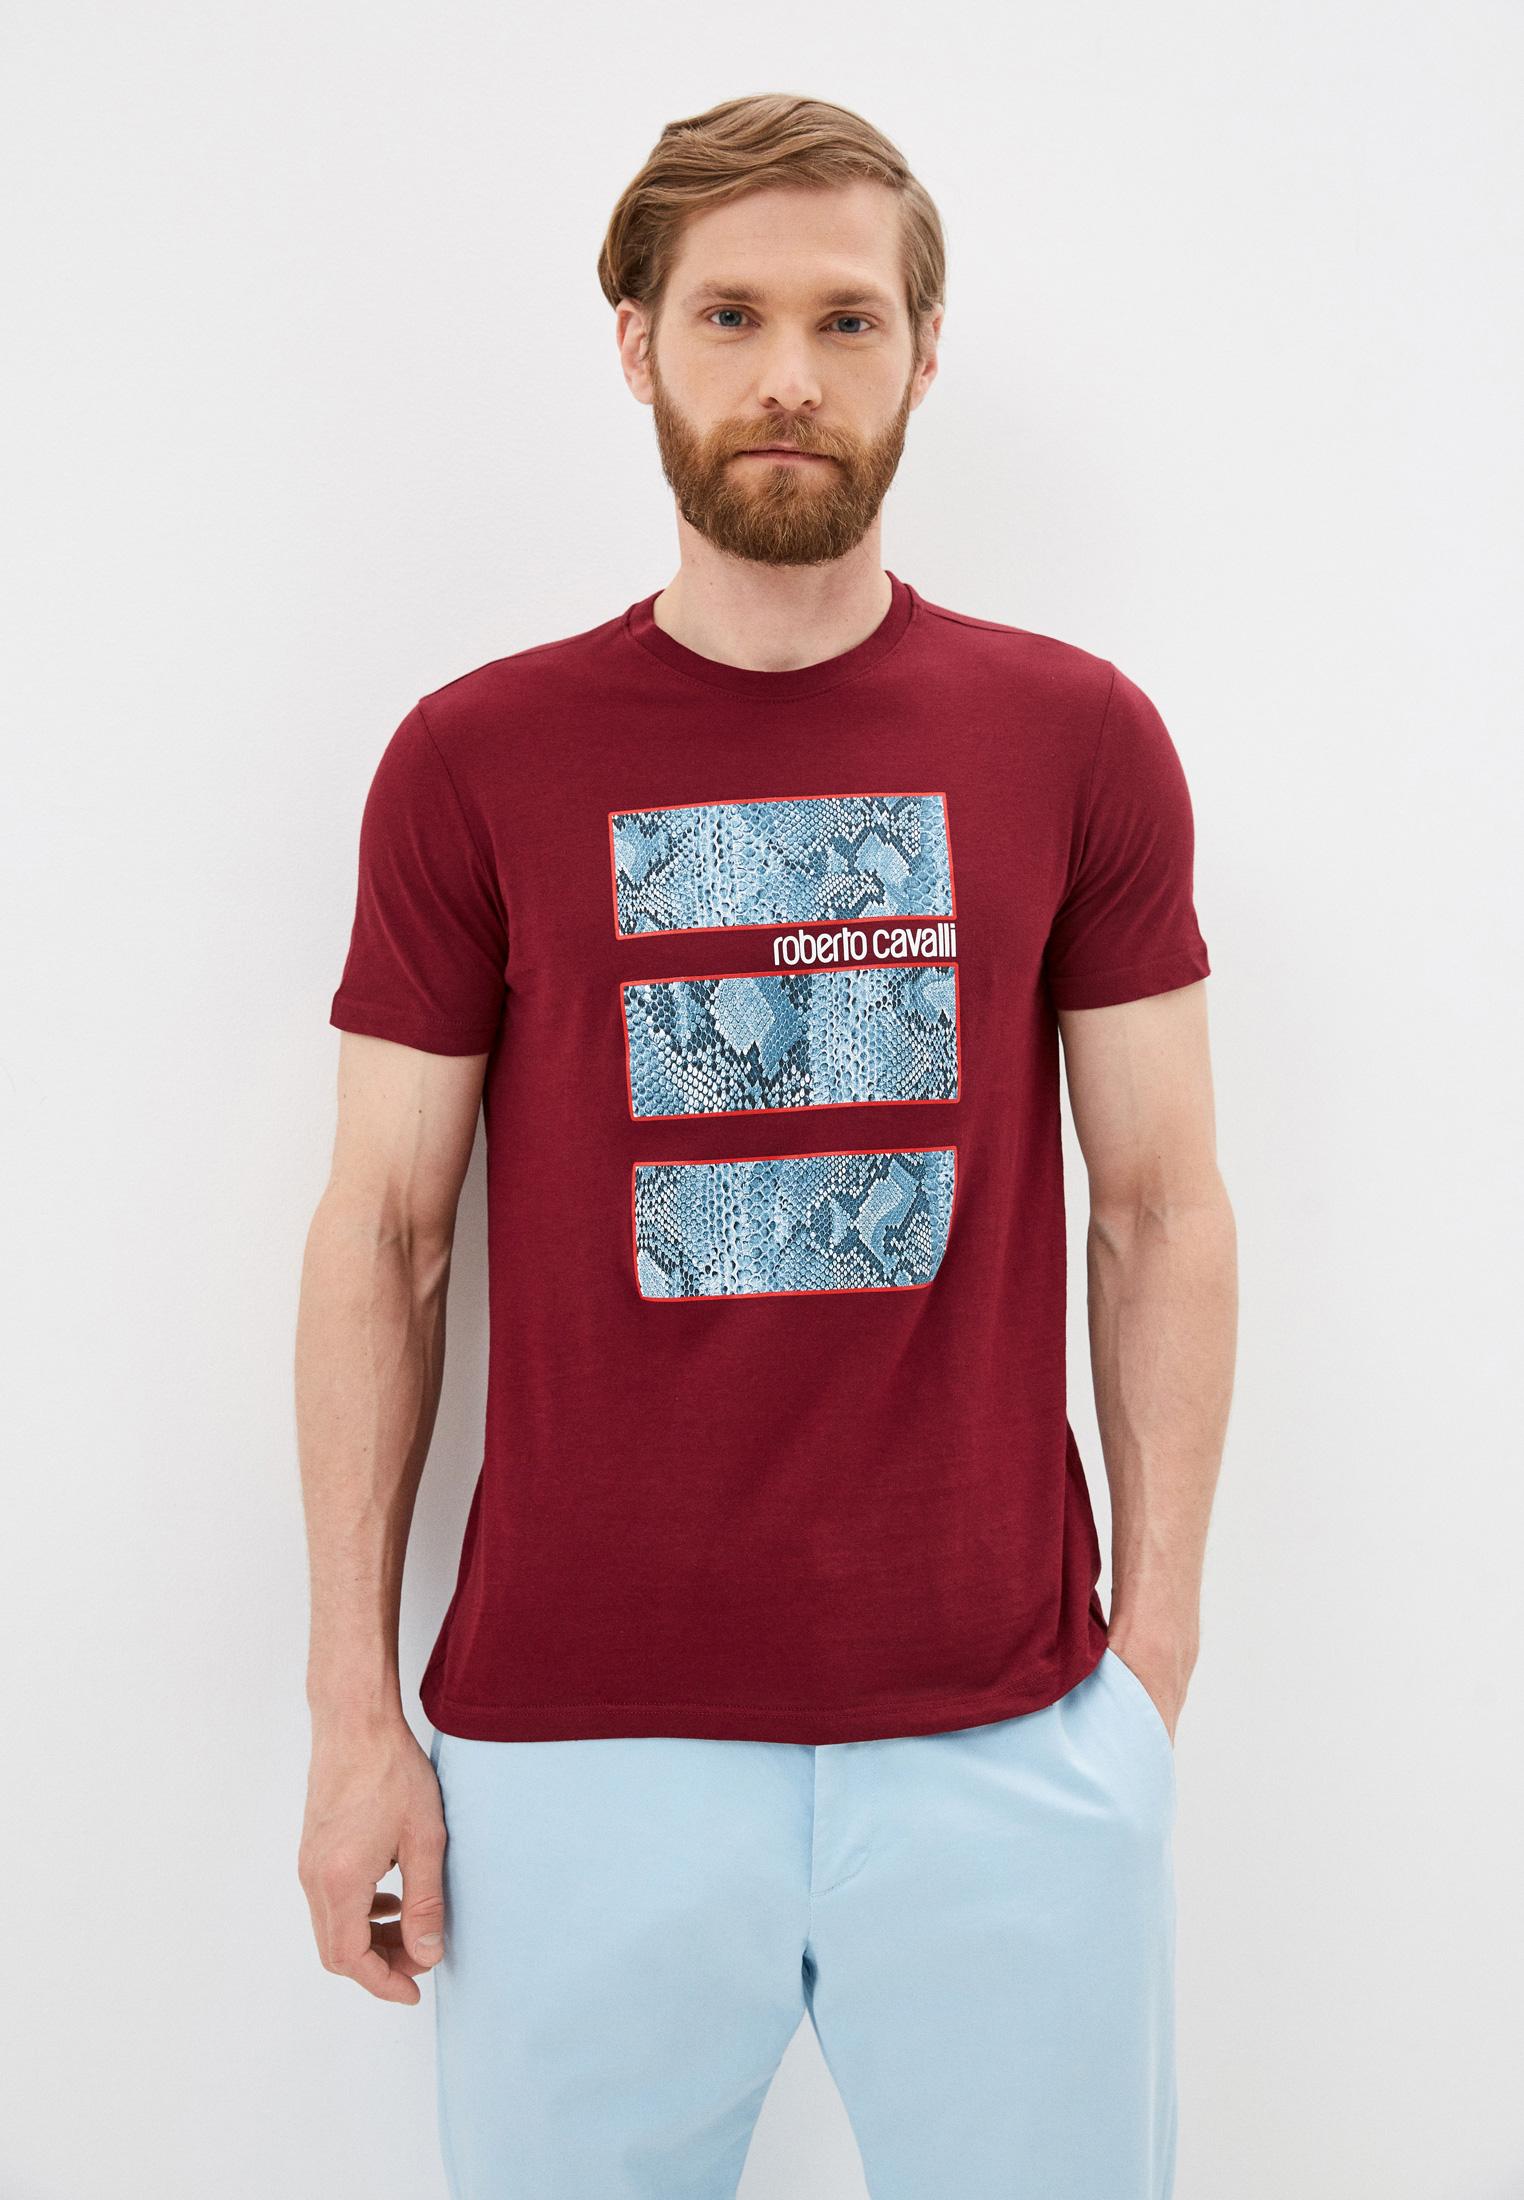 Мужская футболка Roberto Cavalli (Роберто Кавалли) GST690A027